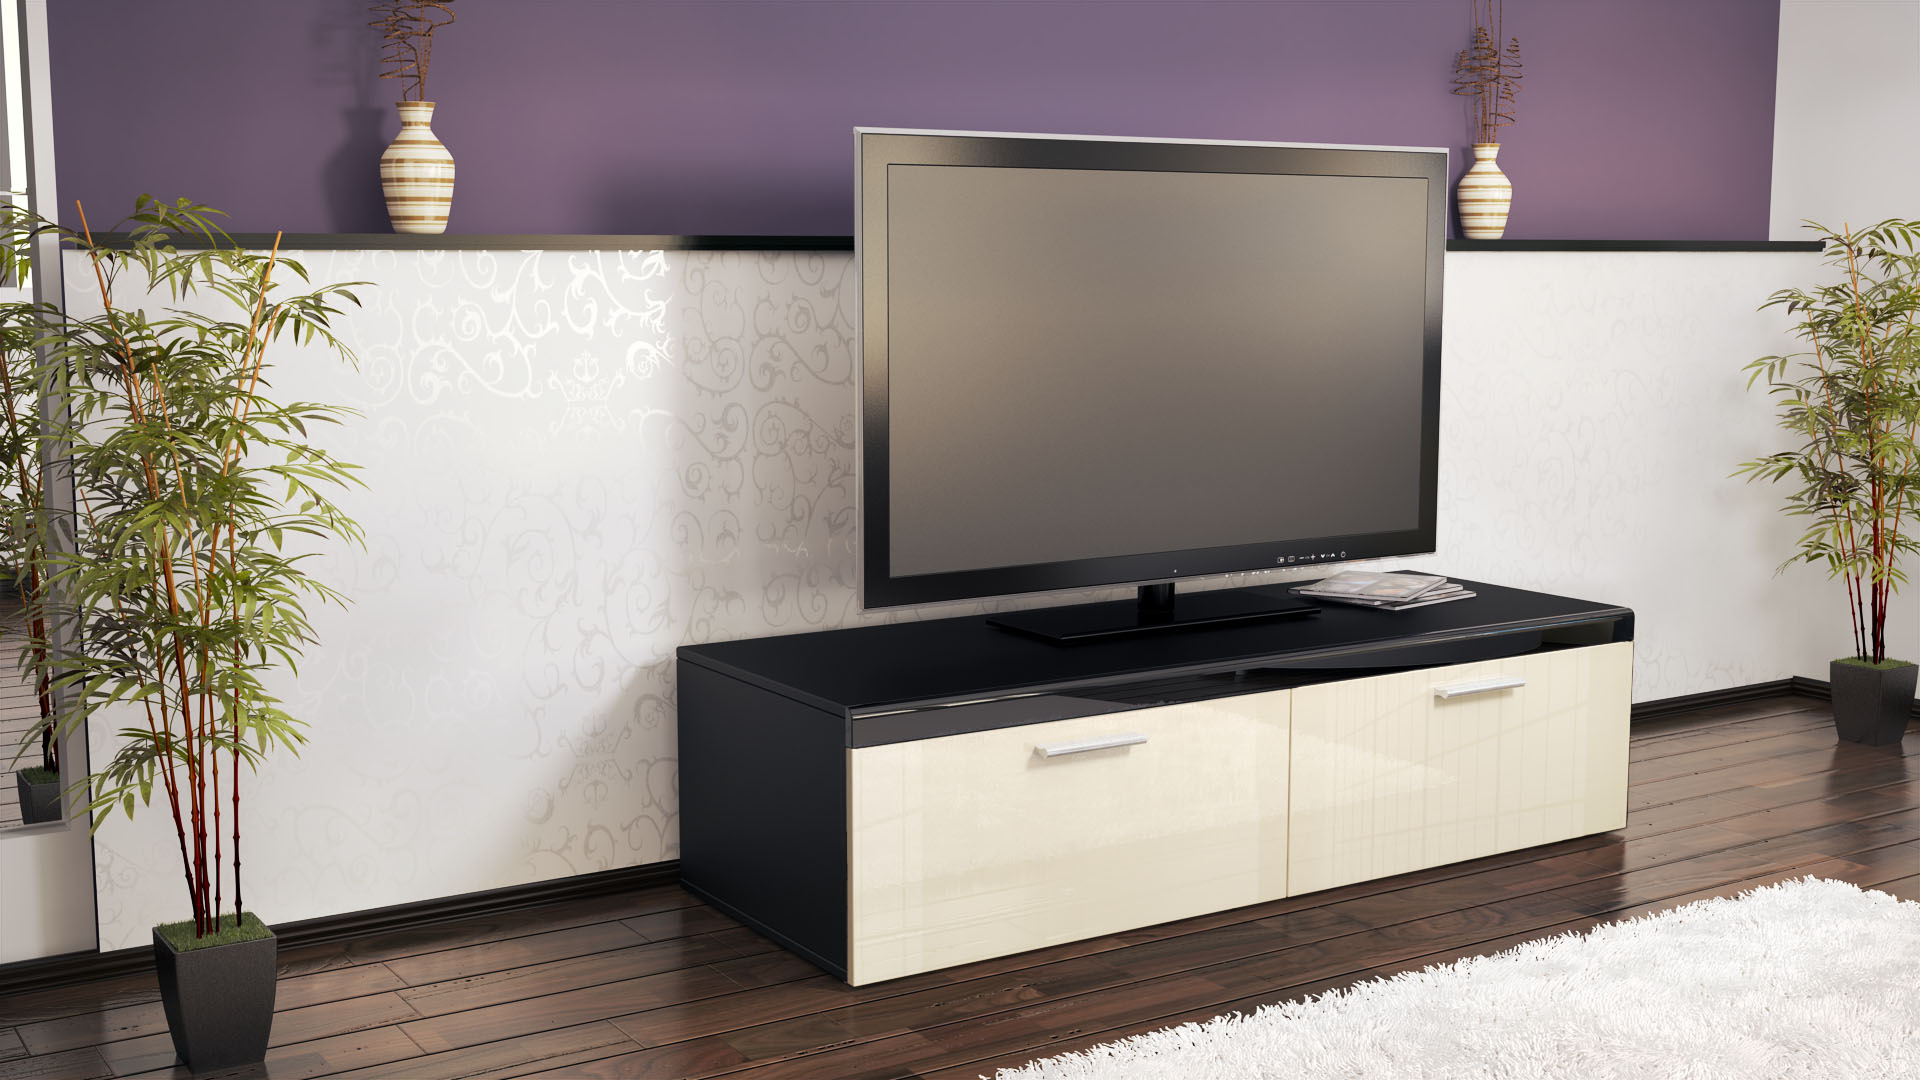 abverkauf tv lowboard board edelstahlgriff atlanta schwarz hochglanz naturt ne ebay. Black Bedroom Furniture Sets. Home Design Ideas